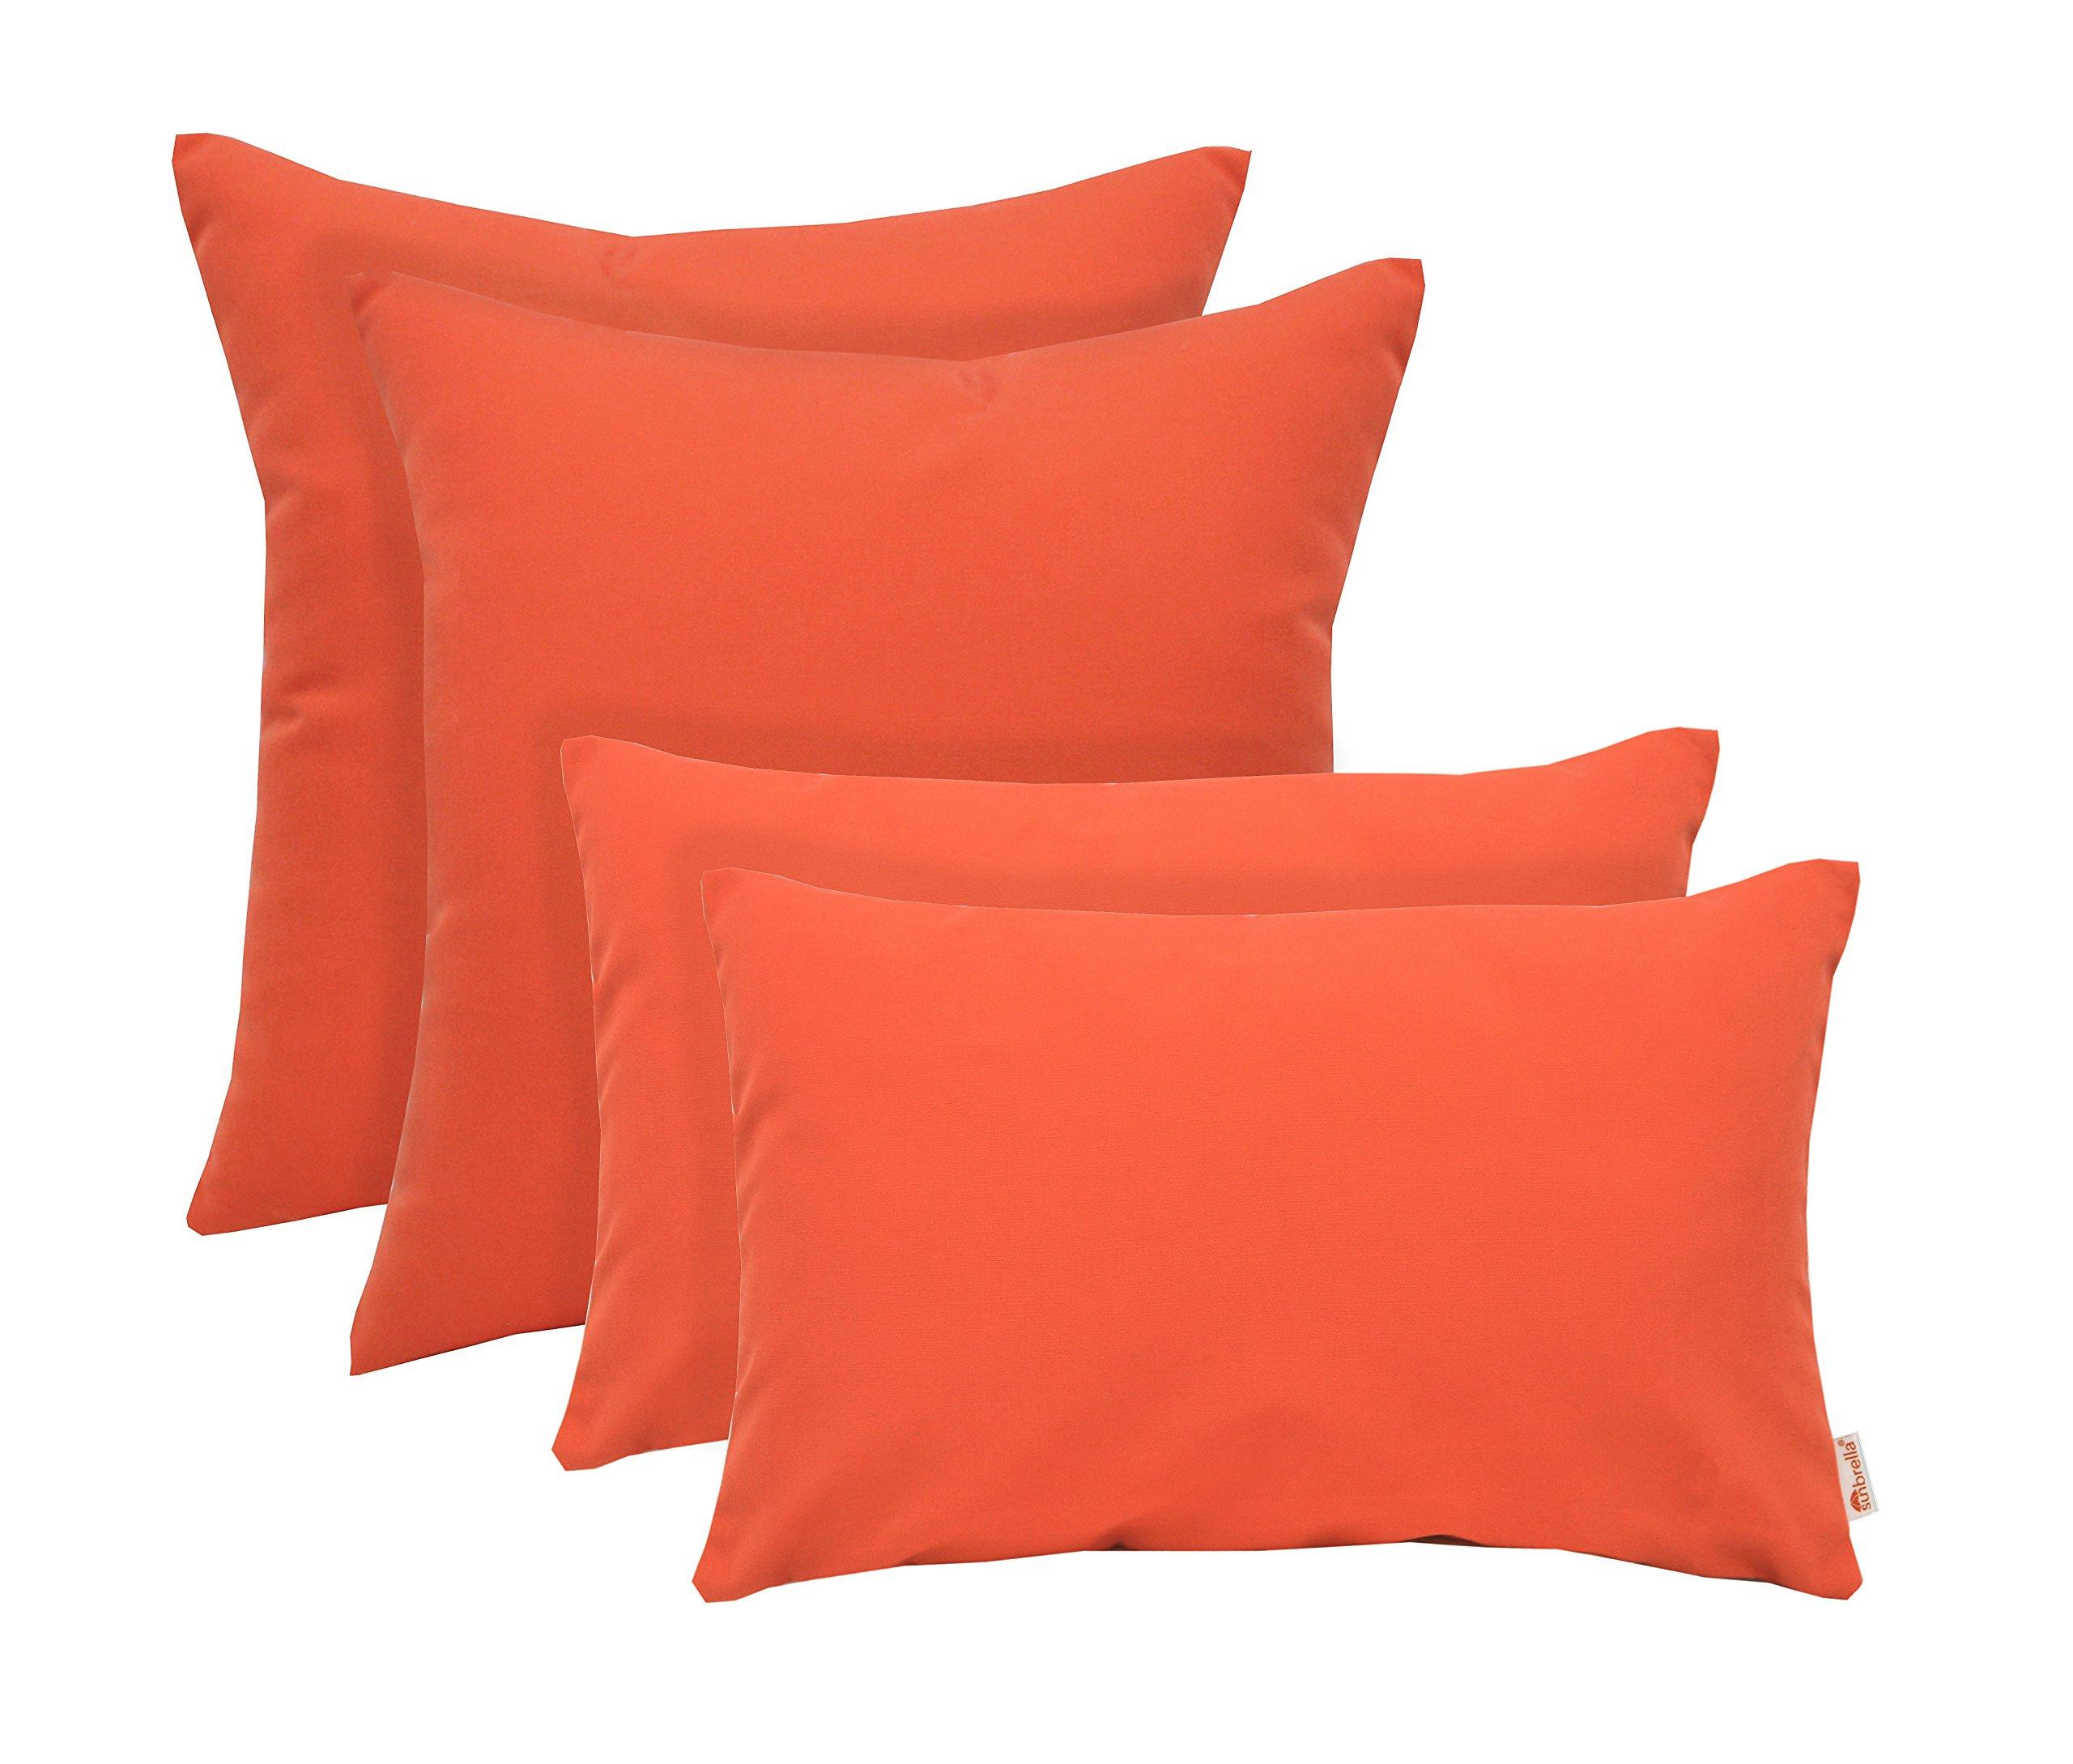 RSH Décor Set of 4 Indoor/Outdoor Square & Rectangle Lumbar Throw Pillows Sunbrella Canvas Melon ~ Vibrant Orange (12'' x 20'' & 17'' x 17'')